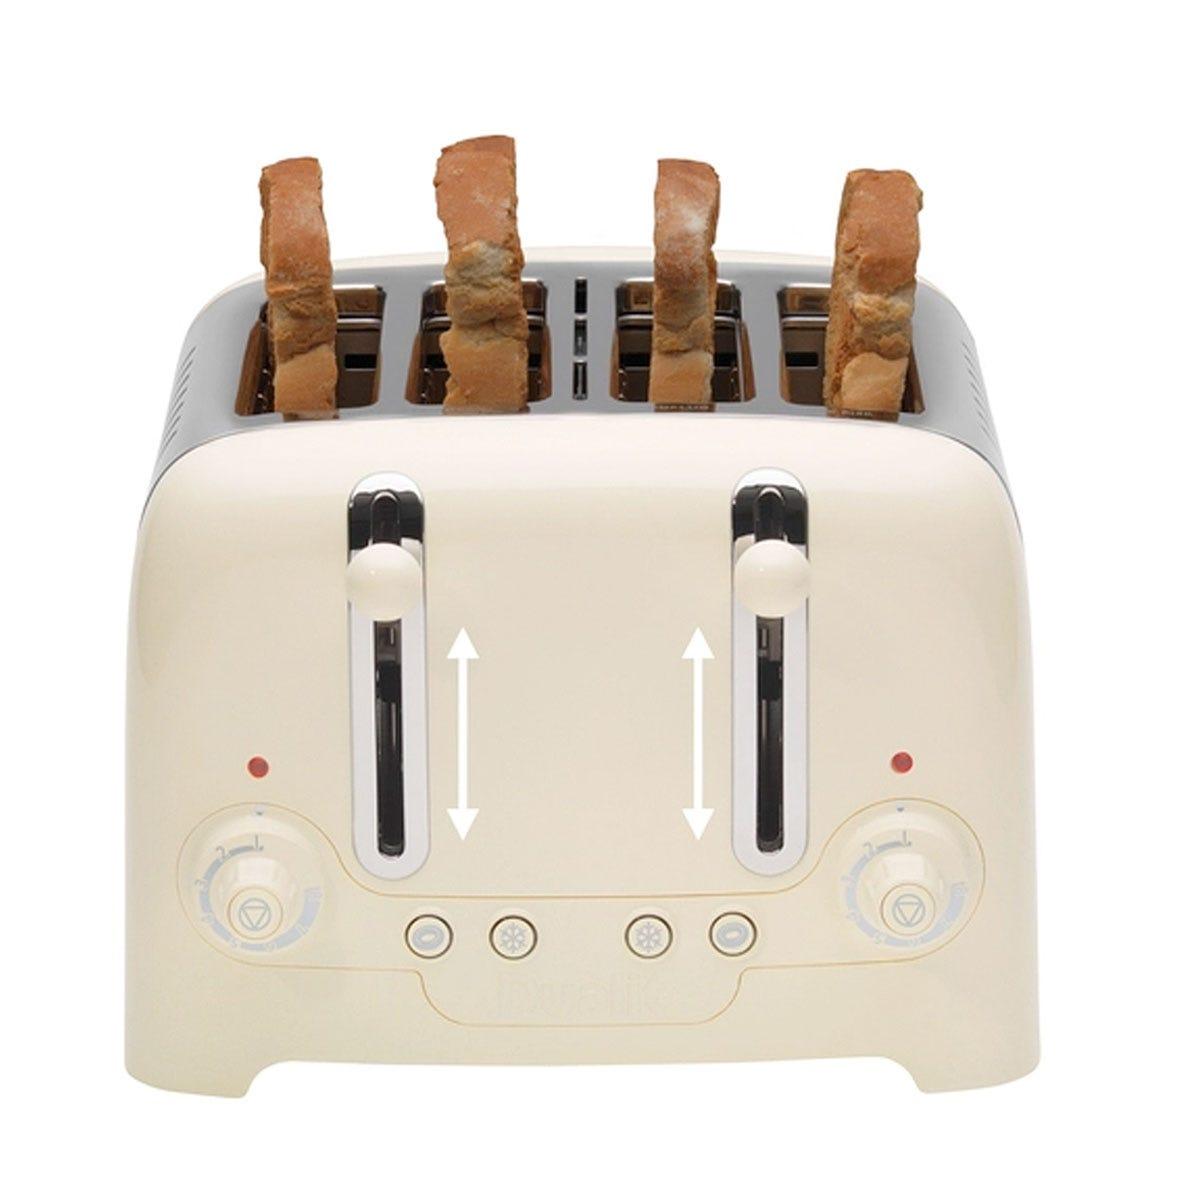 Dualit DA6202 4-Slot High Gloss Lite Toaster - Cream